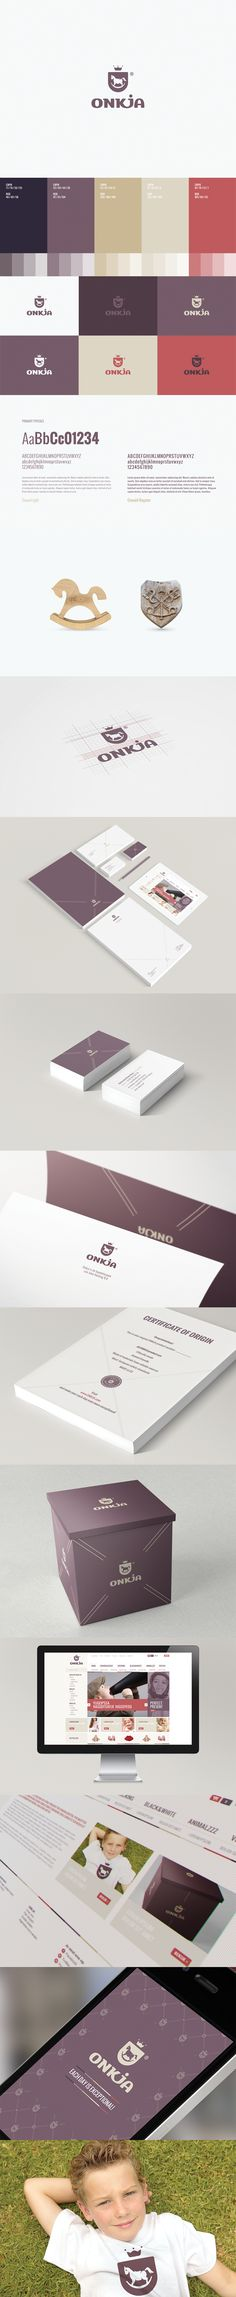 Onkja #identity #packaging #branding #marketing PD